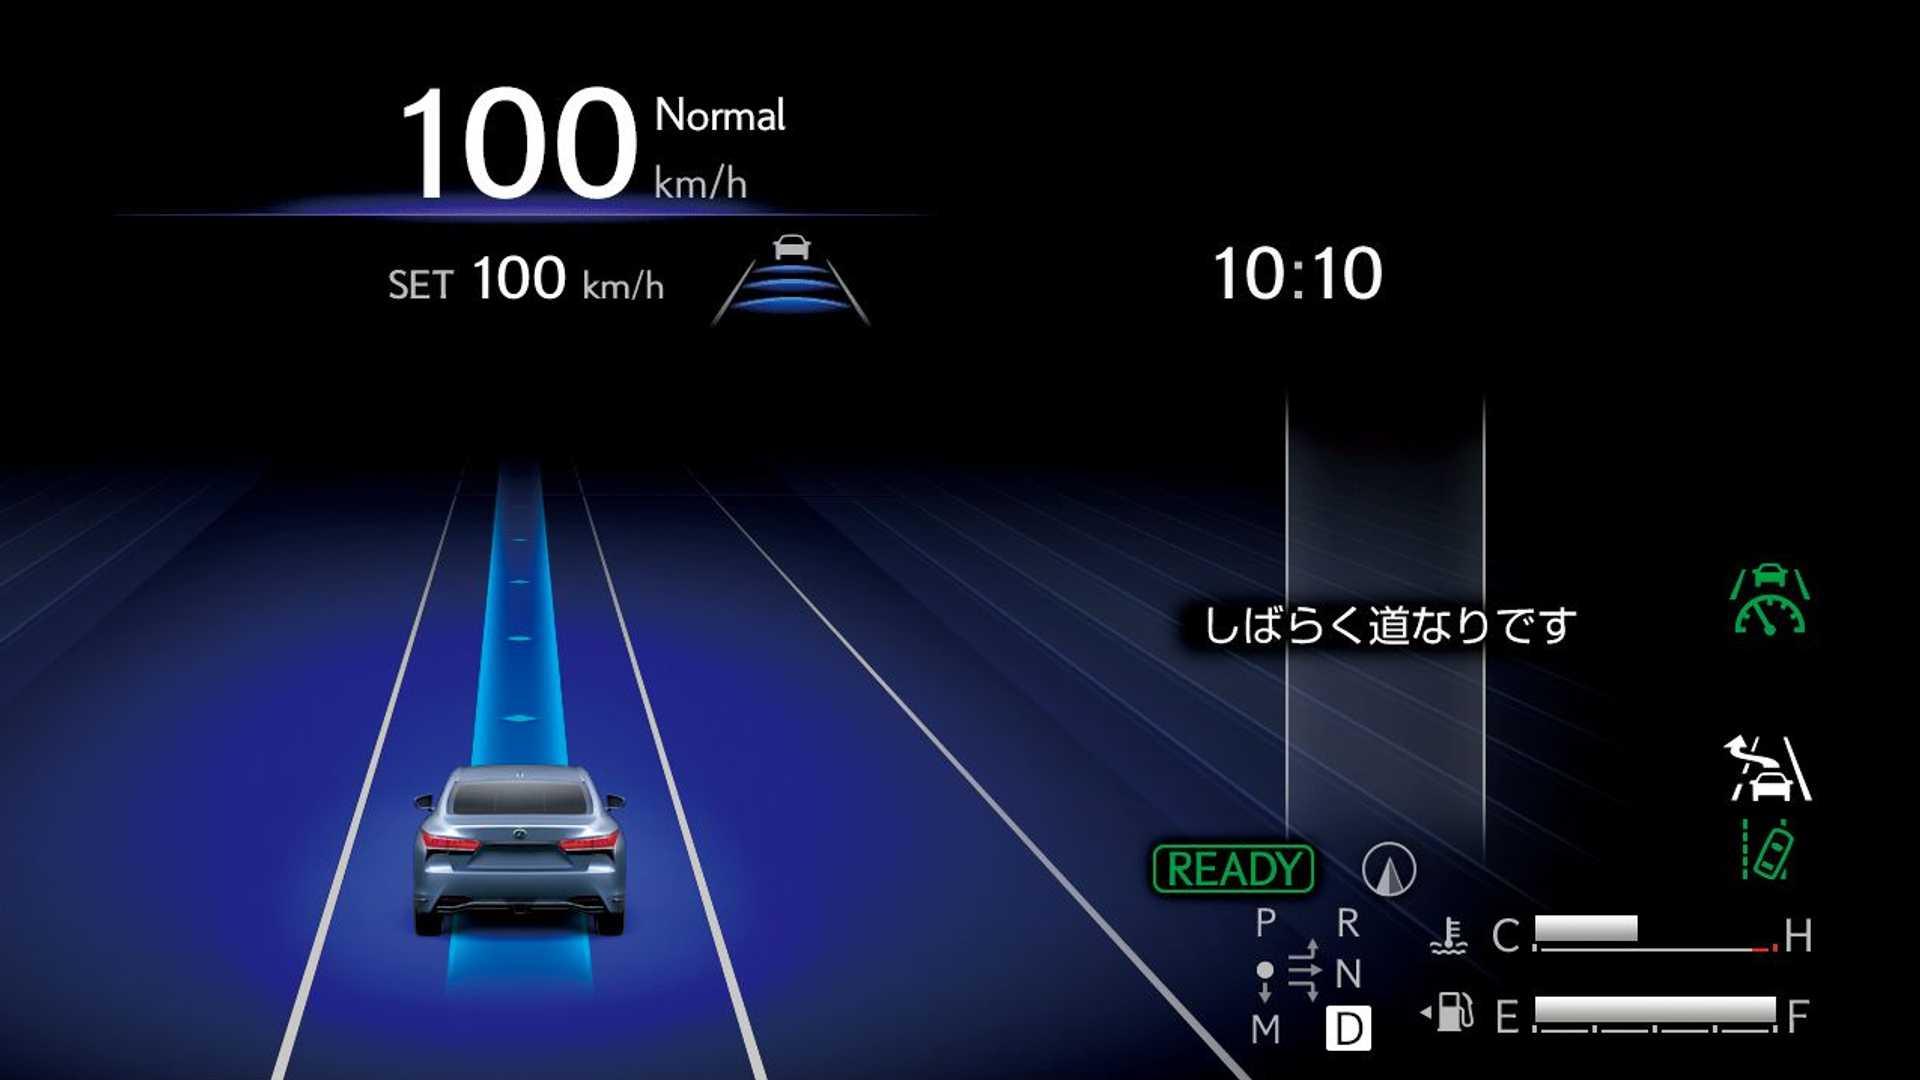 Lexus-LS-And-Toyota-Mirai-Advanced-Drive-9